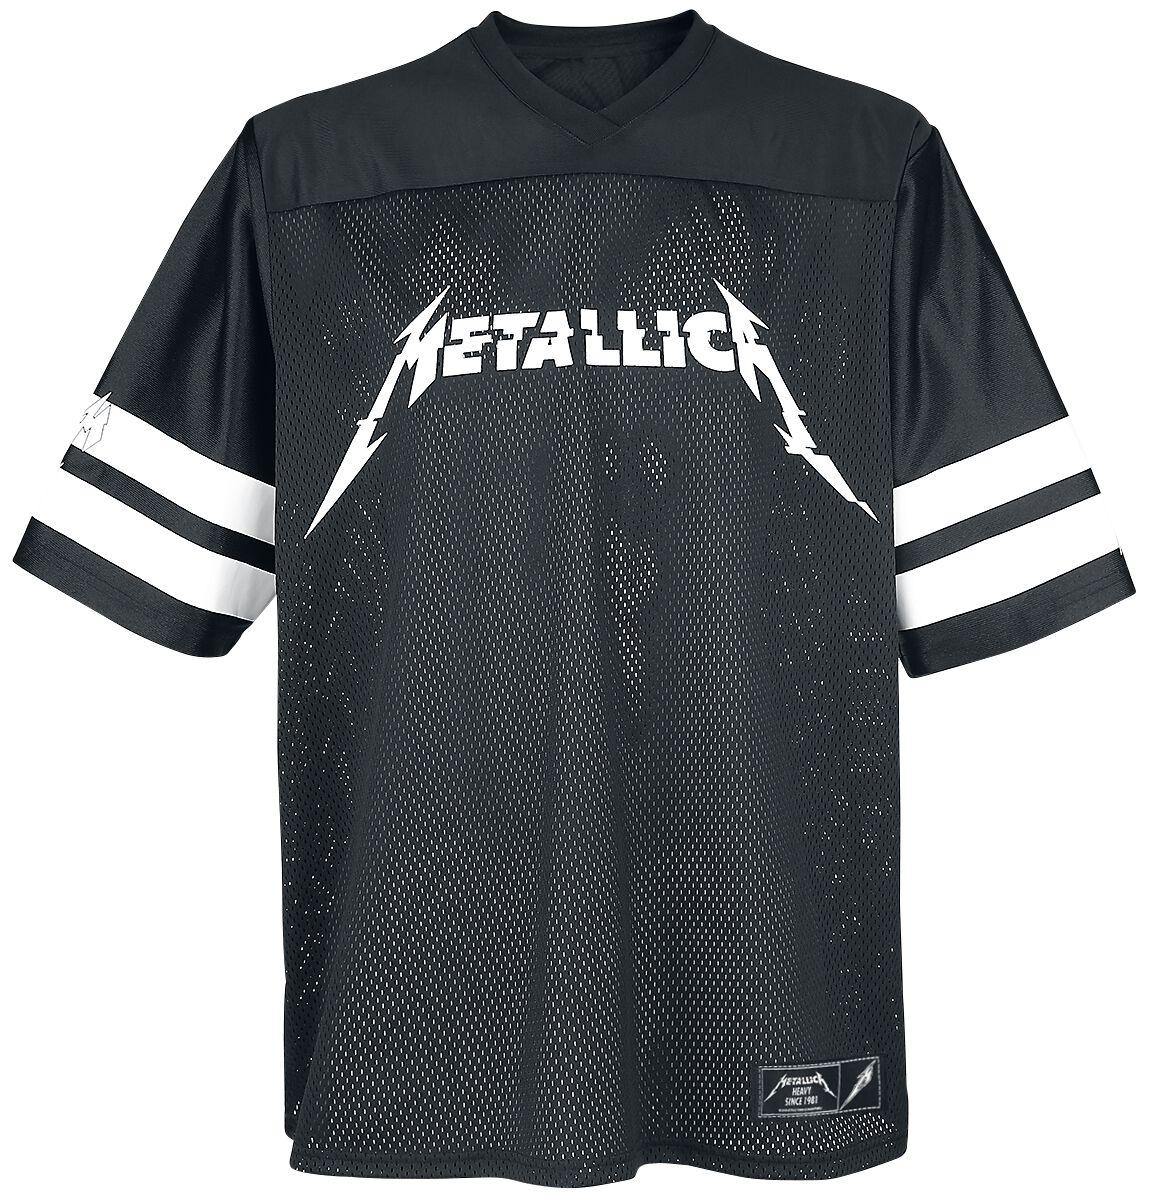 Image of   Metallica Hardwired - Football Jersey T-Shirt sort-hvid